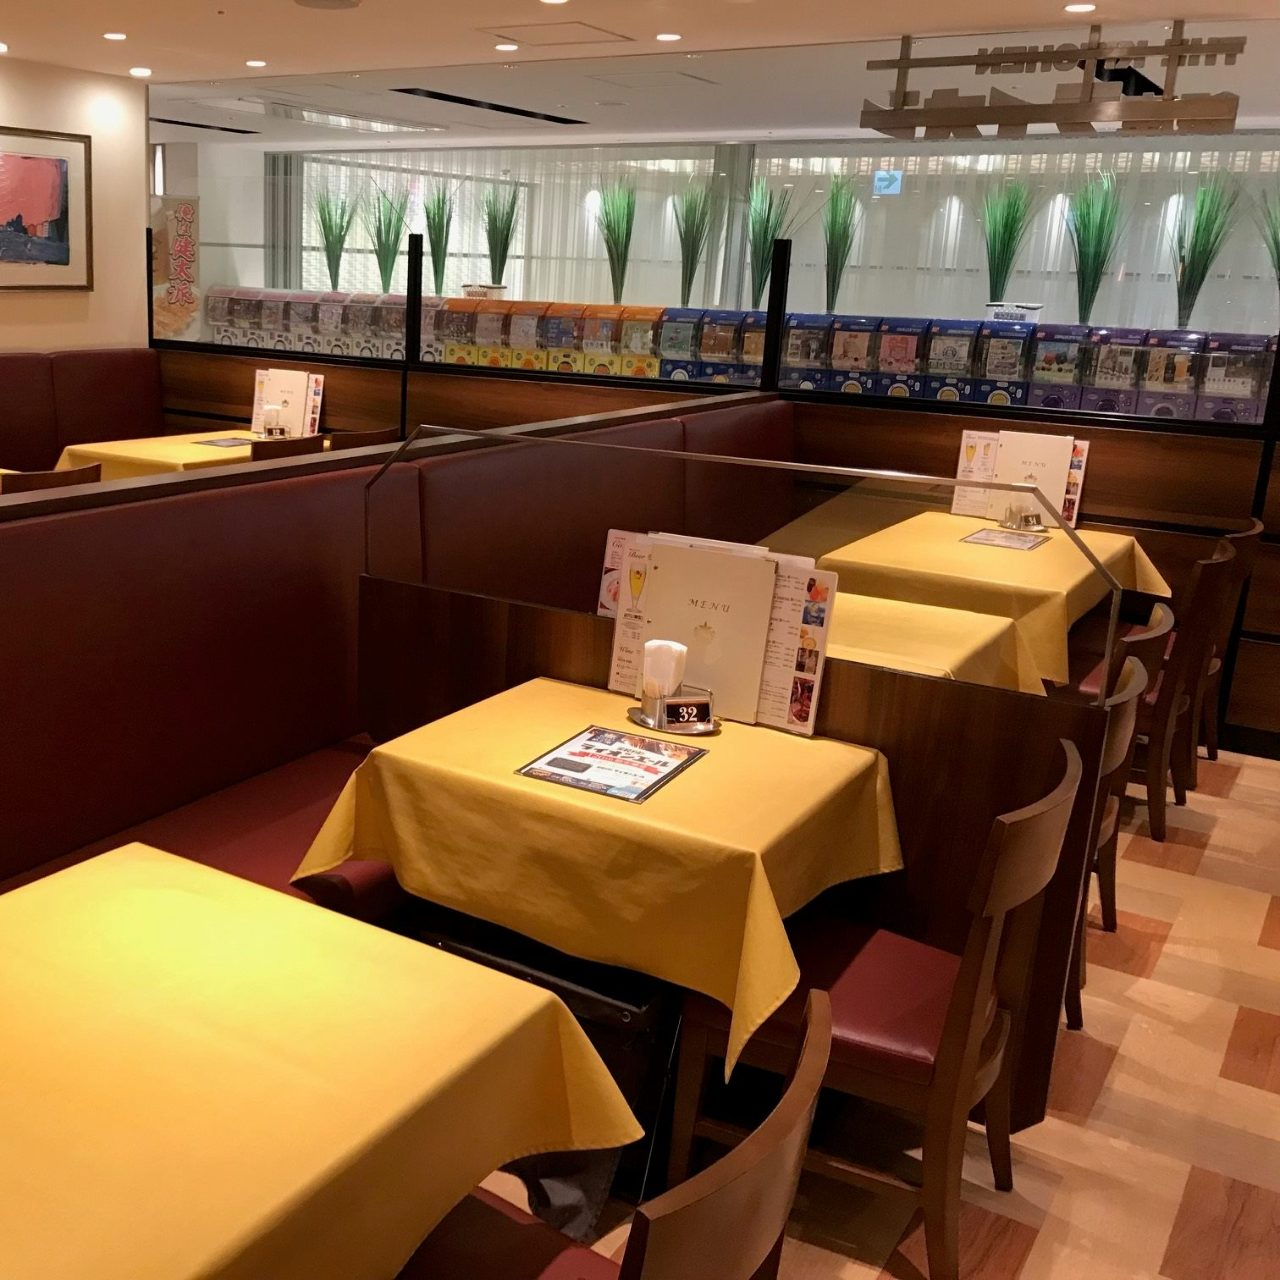 THE KITCHEN 銀座ライオン 東武宇都宮店